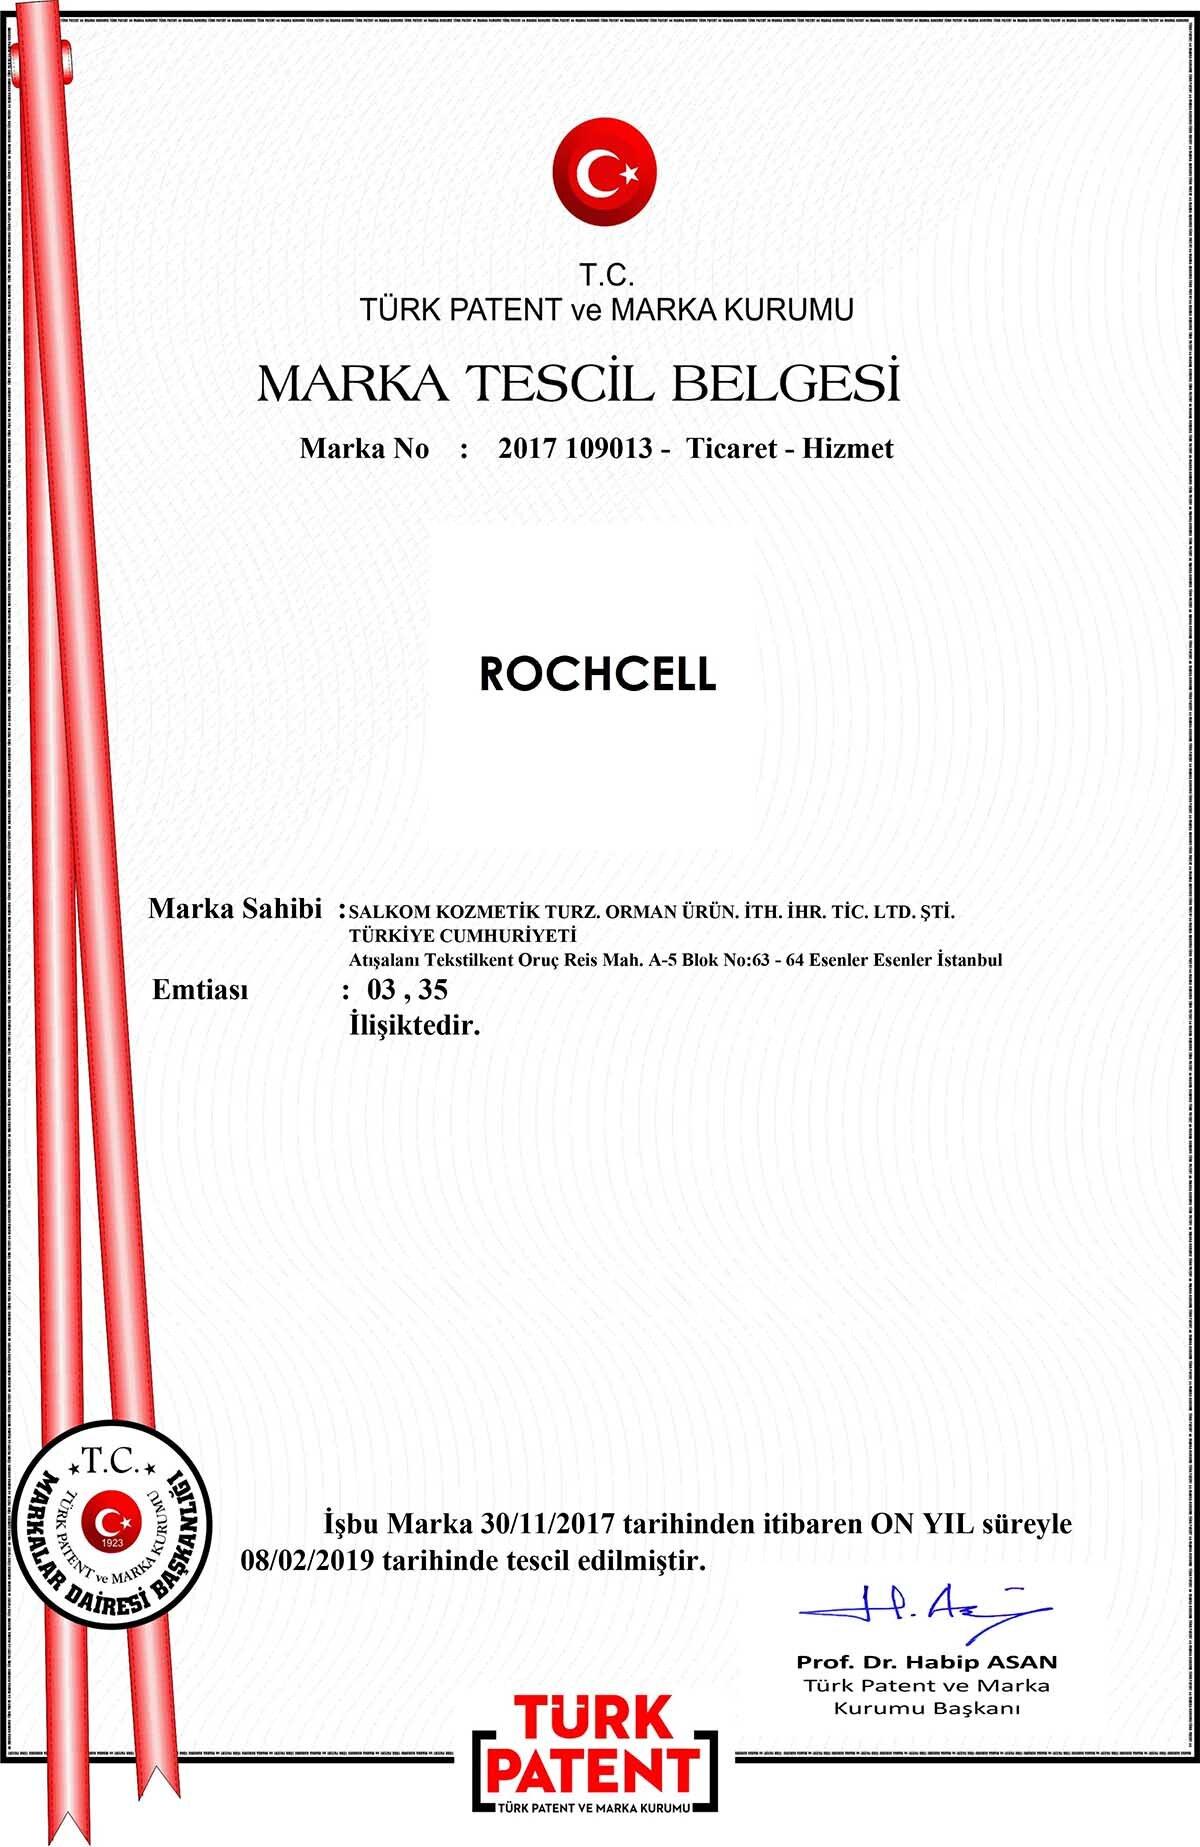 Rochcell Marka Tescil